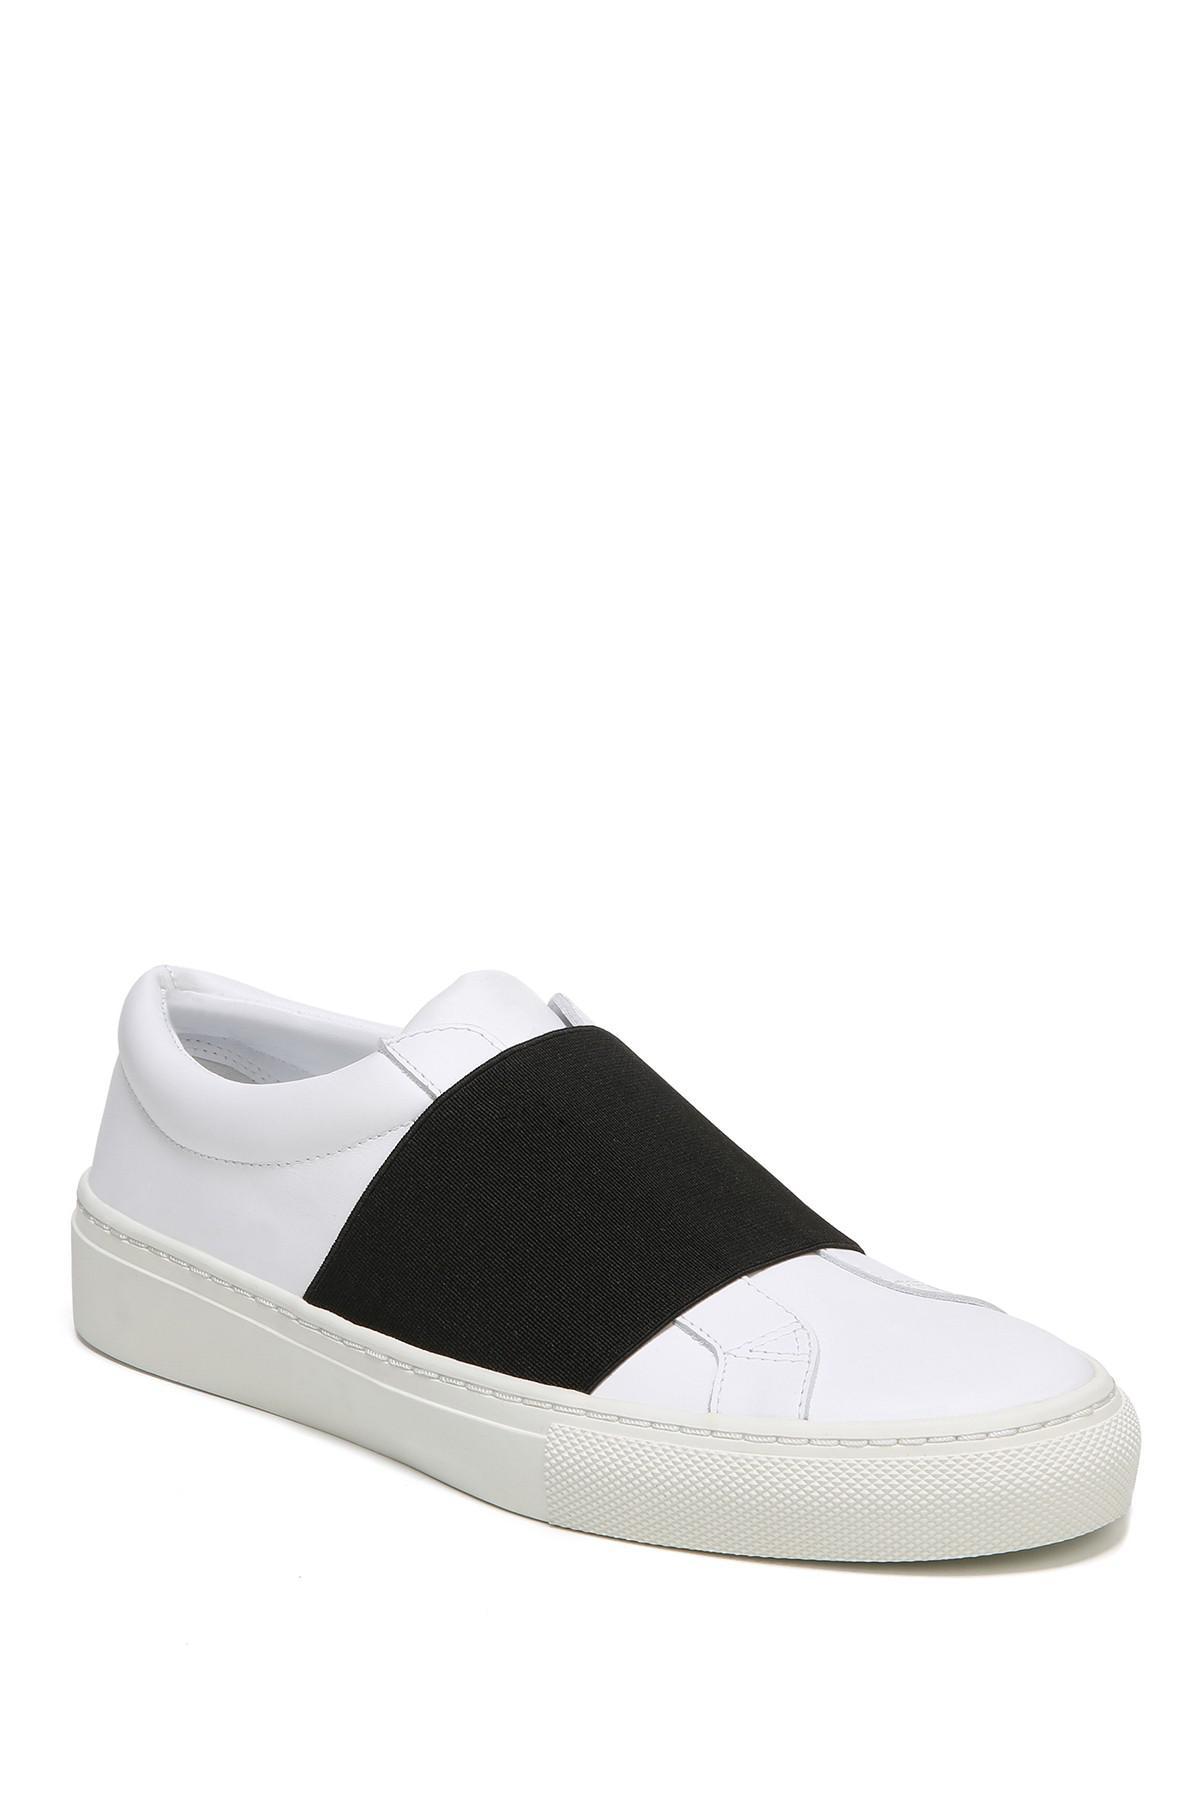 ca7e5dee2017 Lyst - Via Spiga Saran Slip-on Sneaker